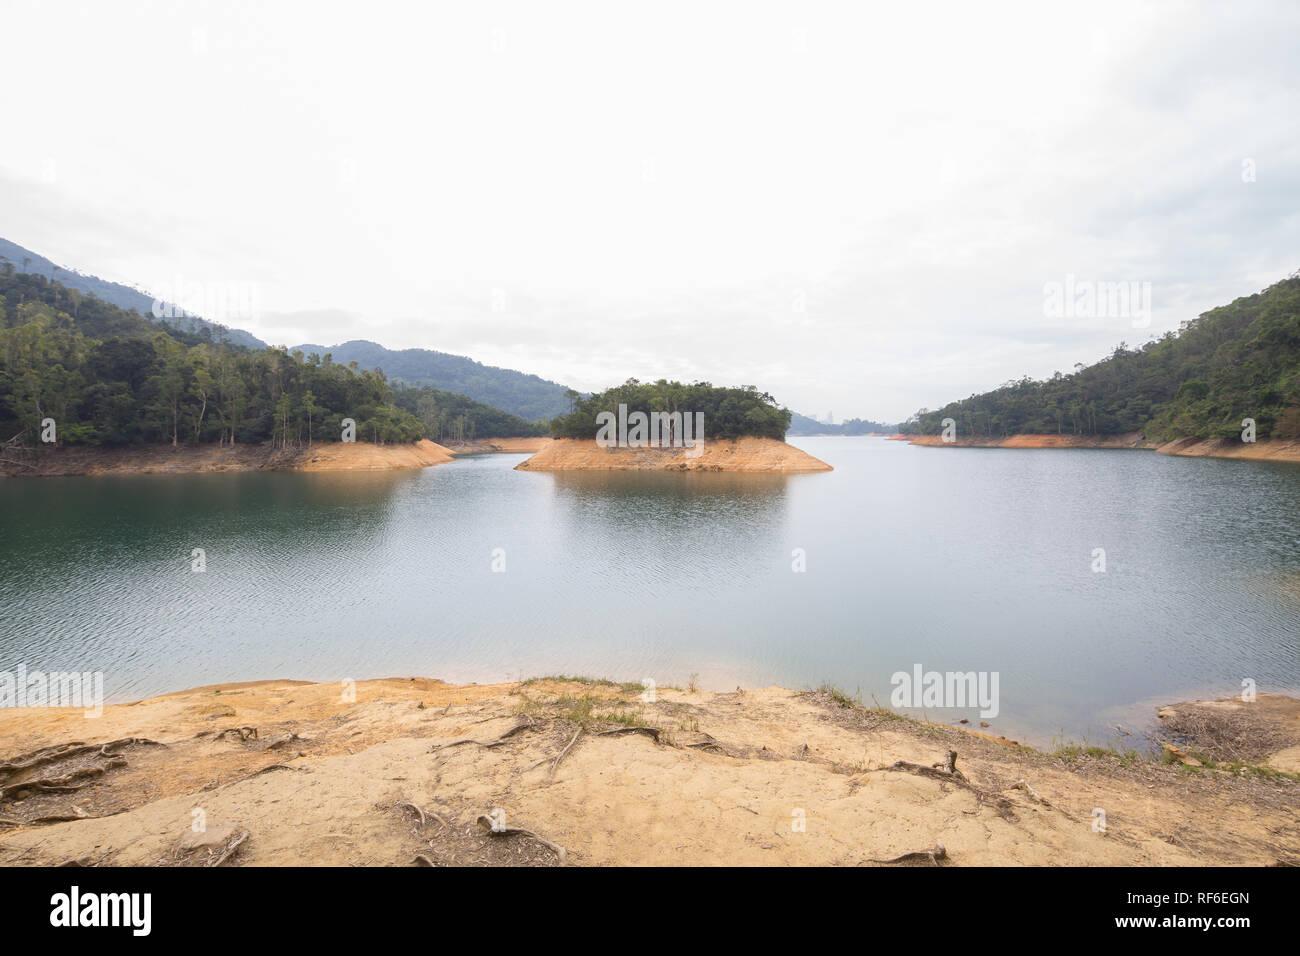 View of Shing Mun Reservoir from the bank, Hong Kong - Stock Image